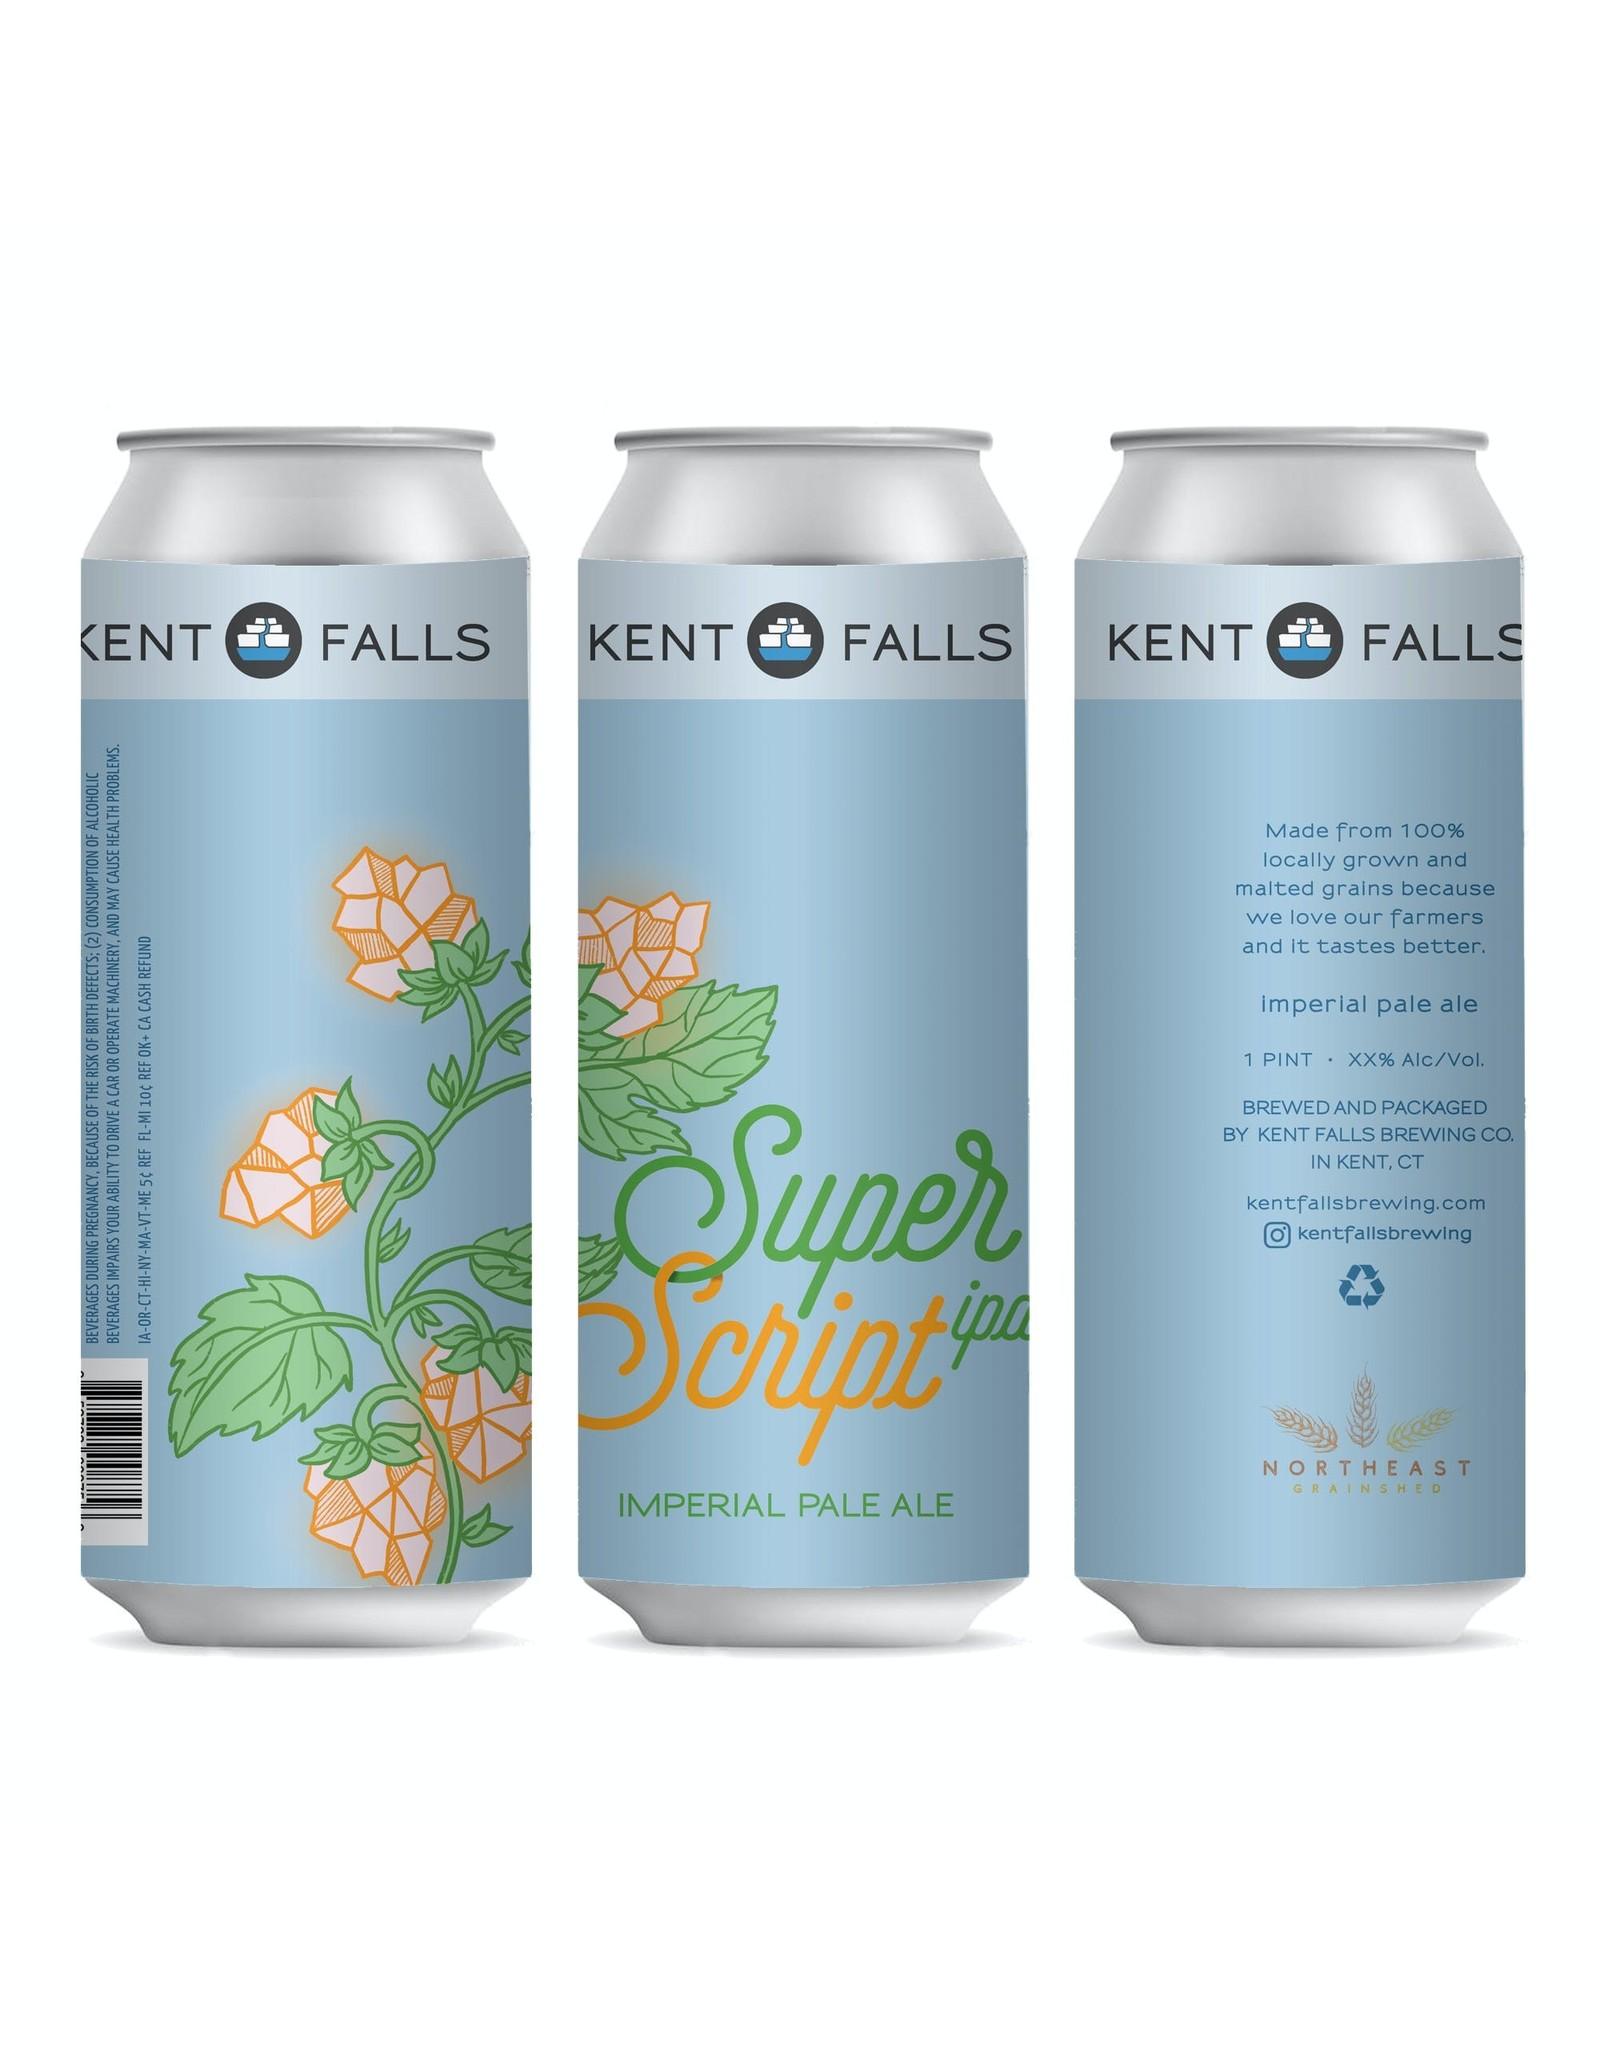 Kent Falls Super Script Imperial Pale Ale